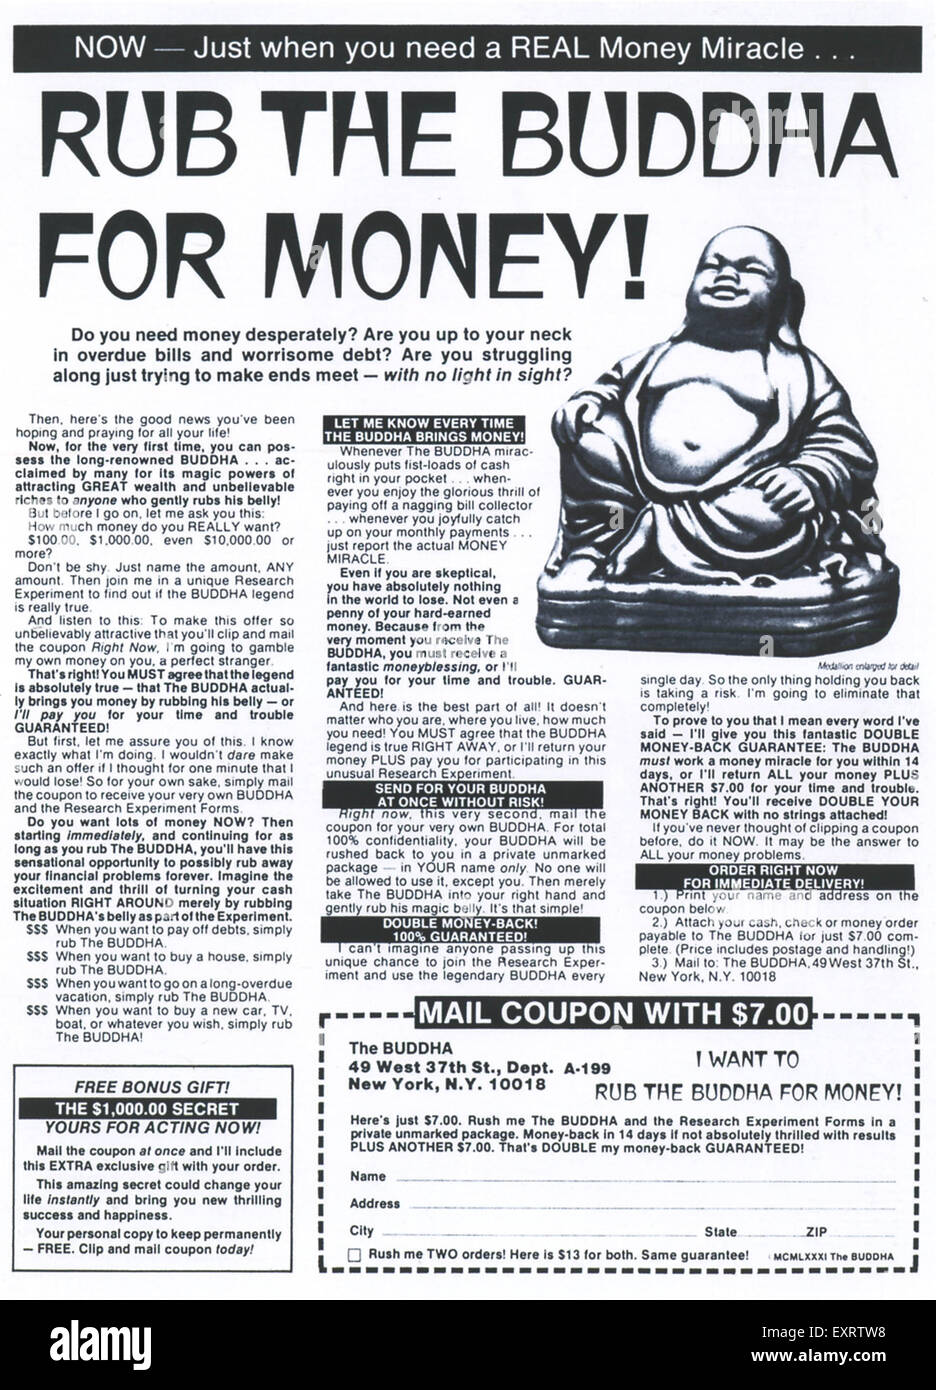 1980s USA Buddha Magazine Advert - Stock Image